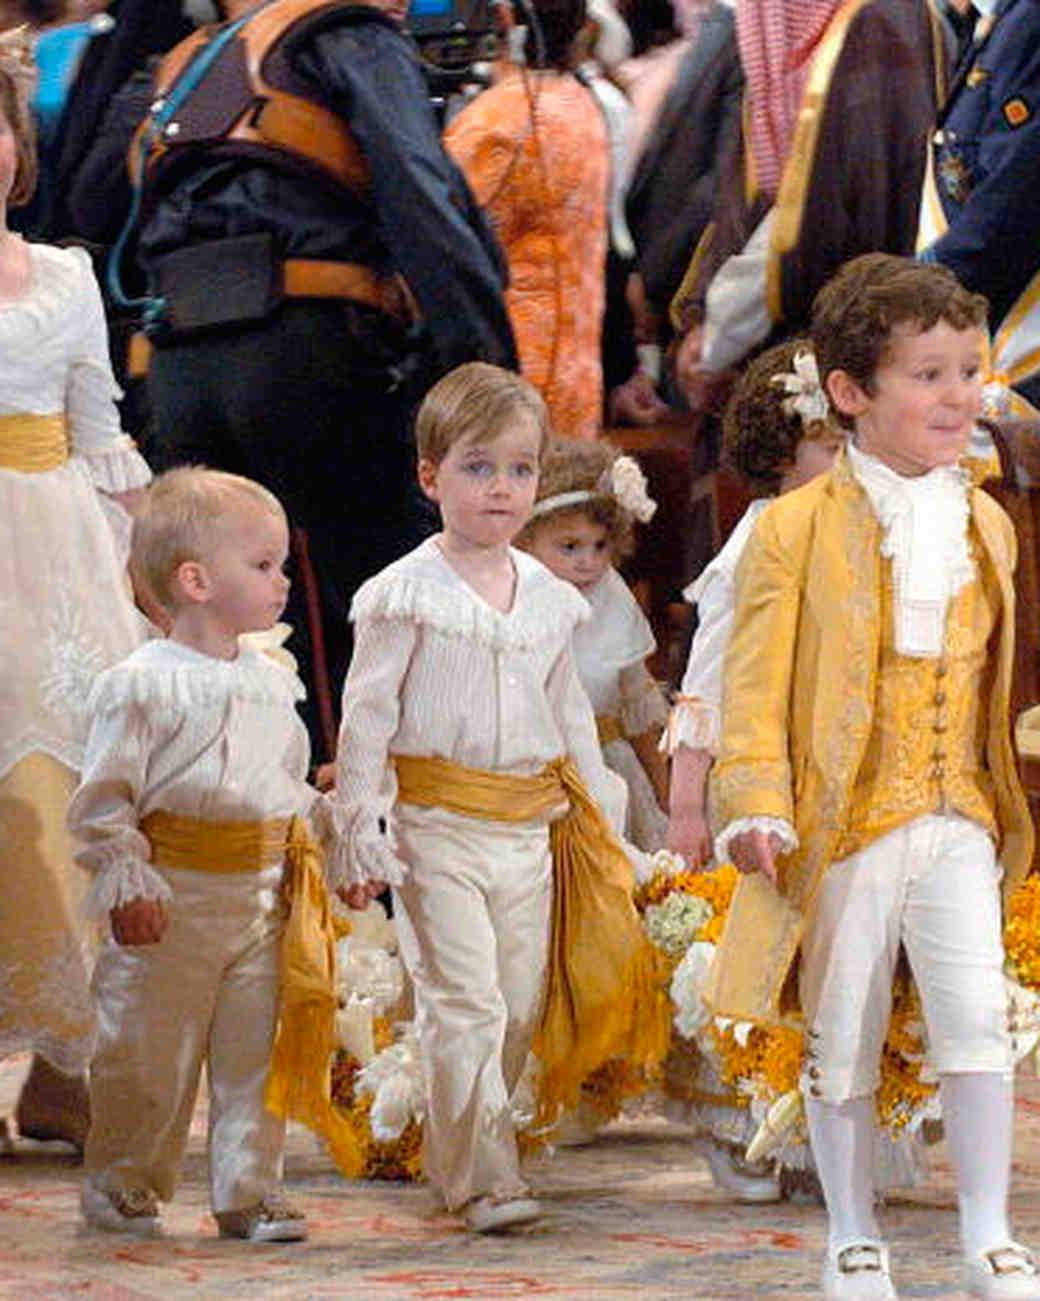 royal-children-wedding-50887471-0415.jpg